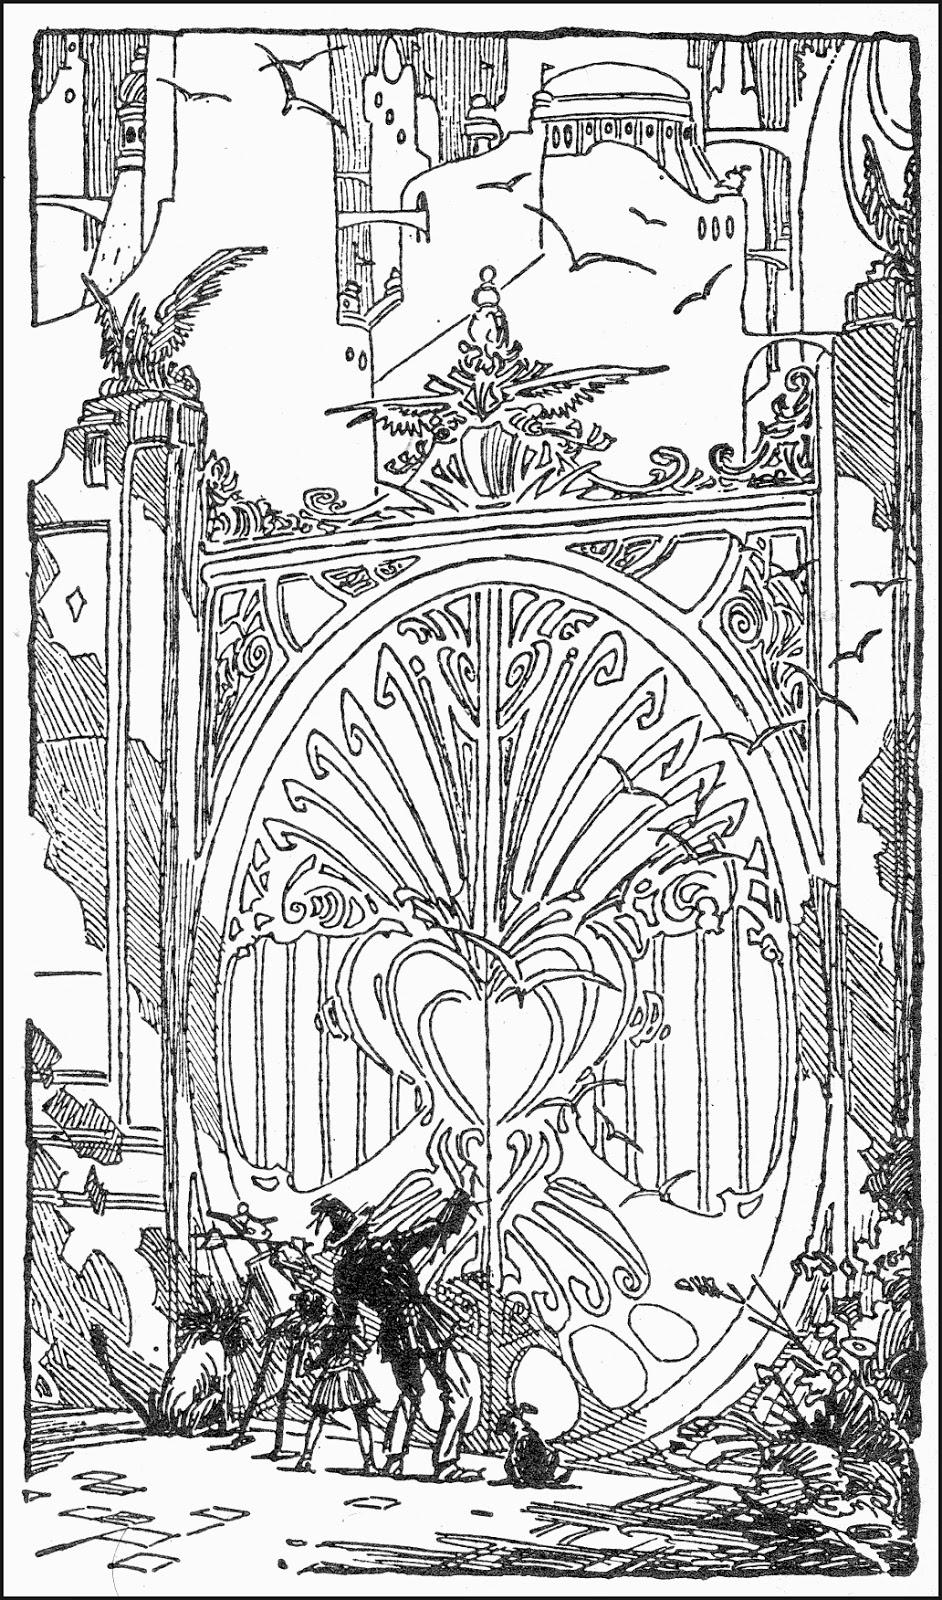 Roy krenkel 1918 1983 the wonderful wizard of oz 1965 for The wonderful wizard of oz coloring pages